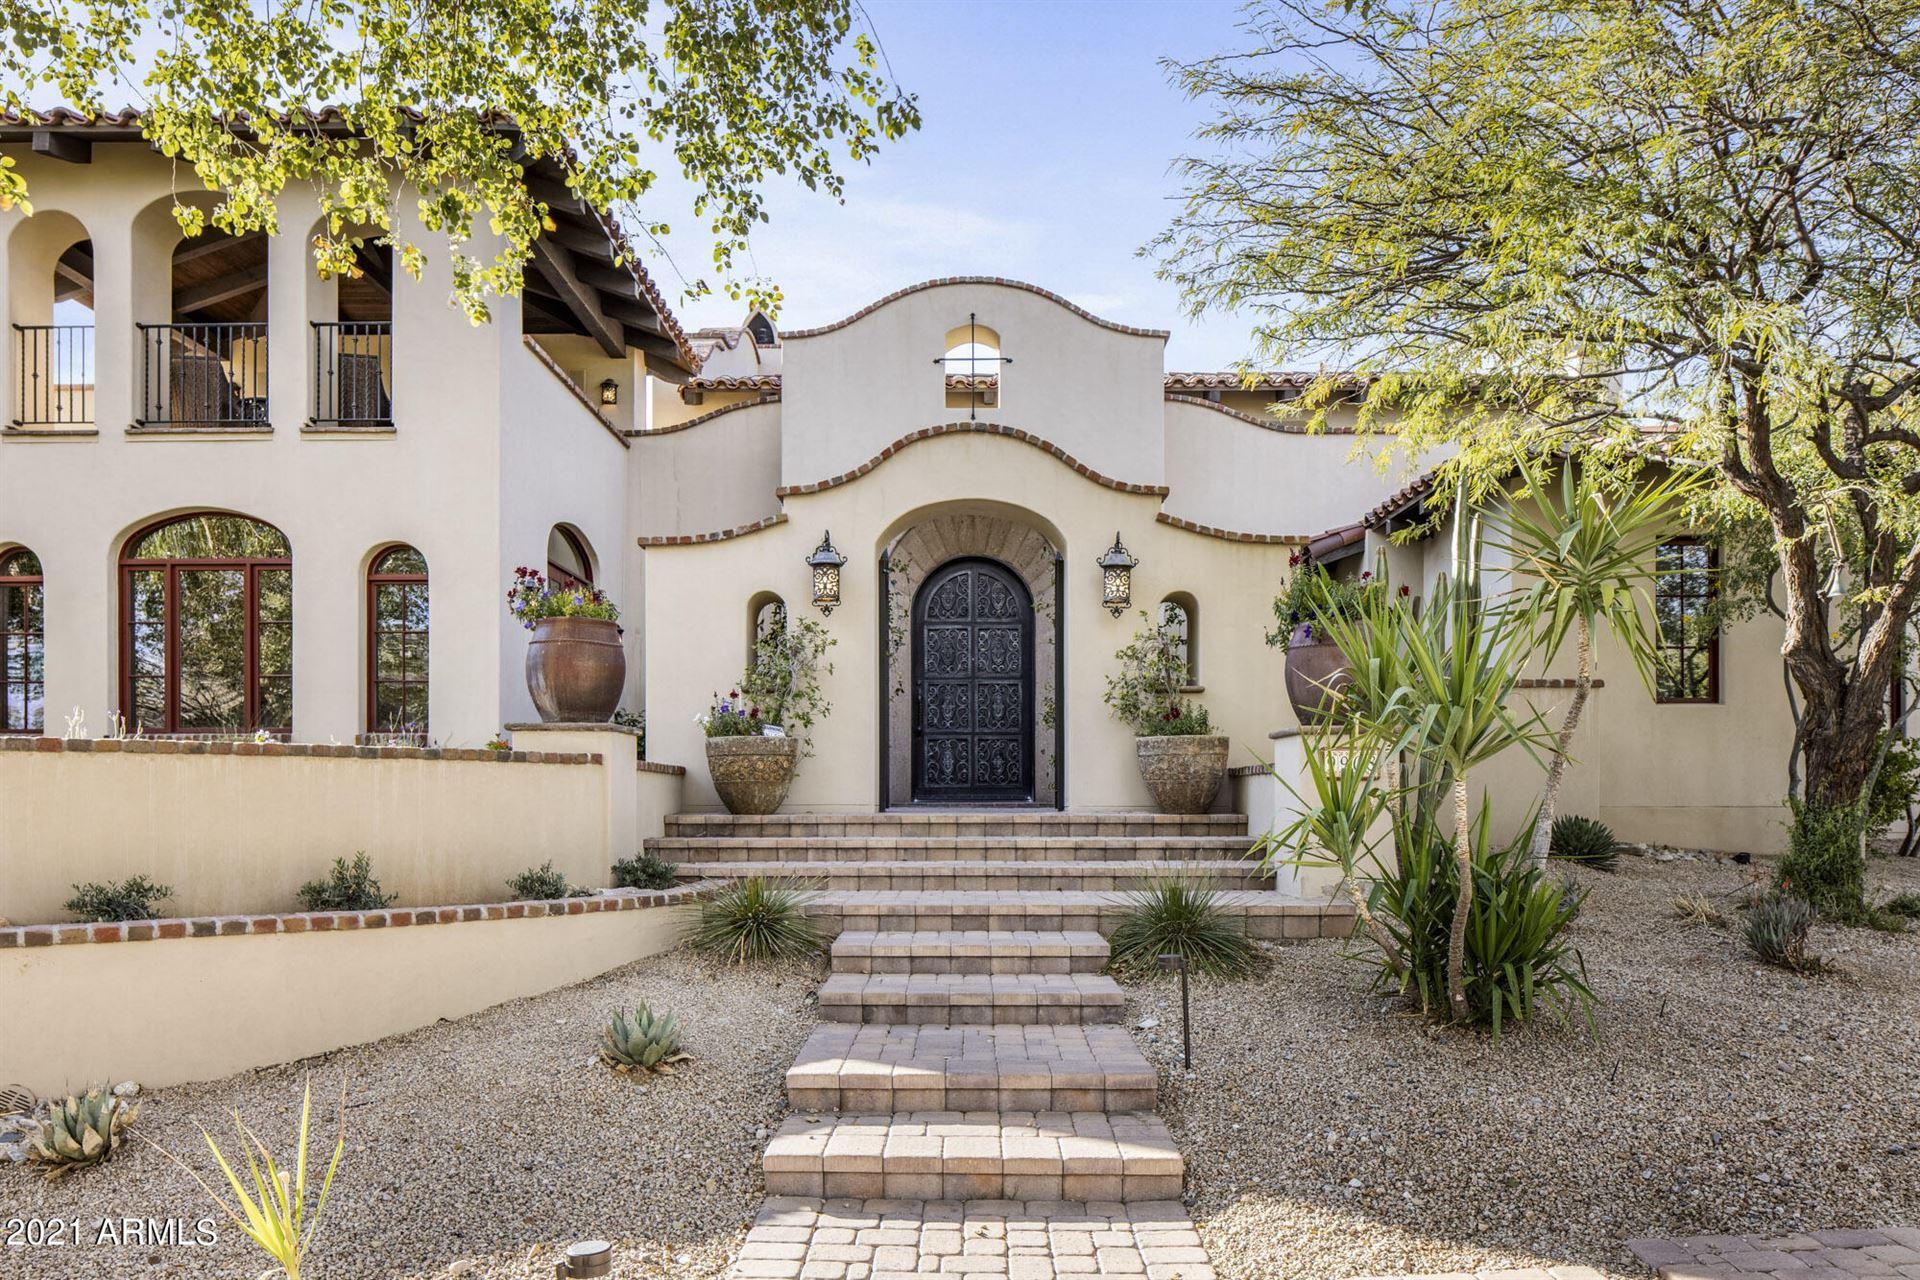 Photo of 9908 E KEMPER Way, Scottsdale, AZ 85255 (MLS # 6205388)